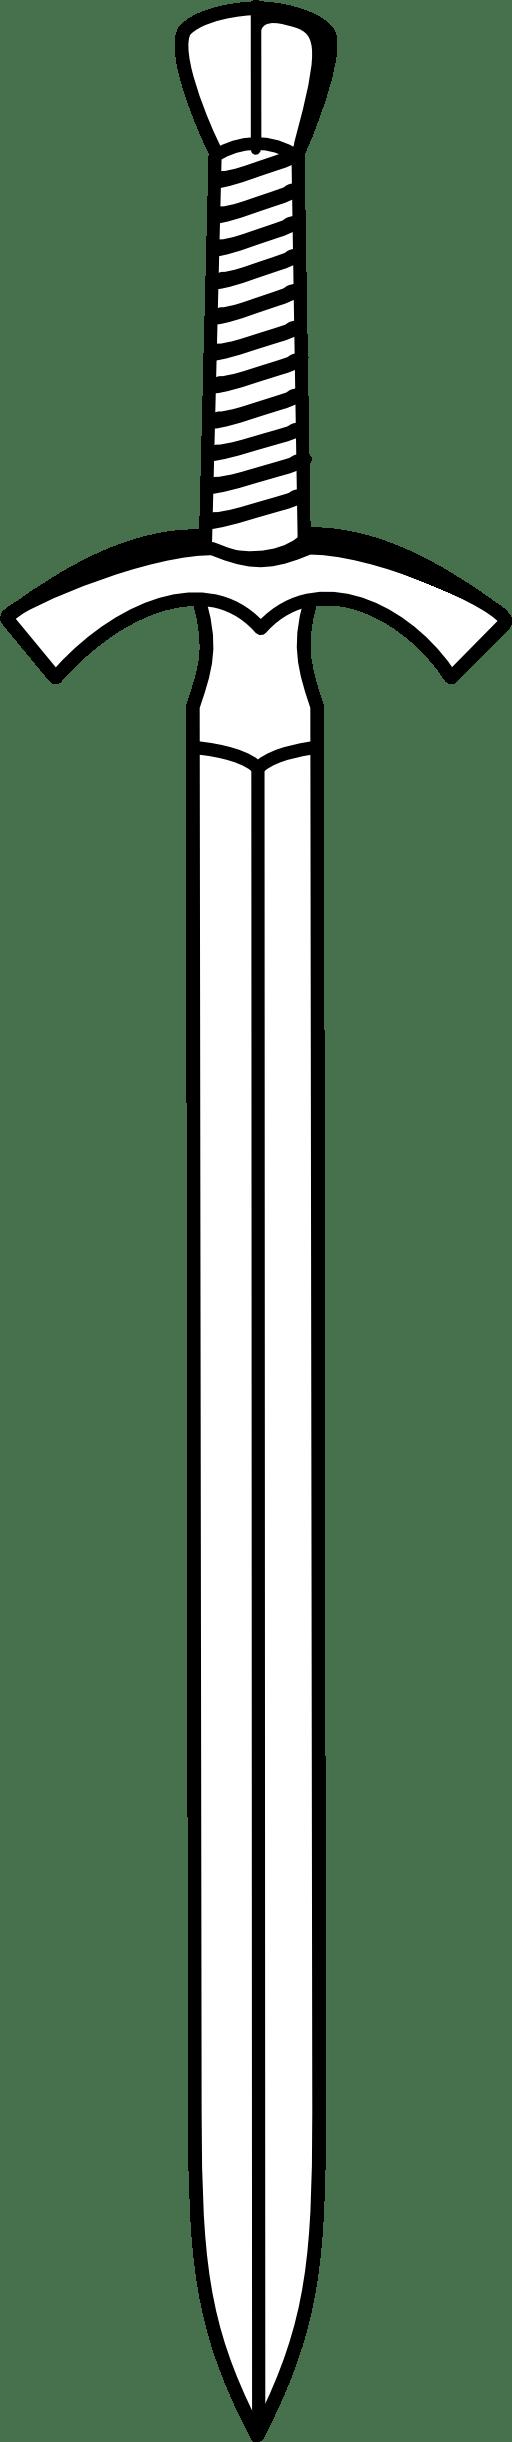 hight resolution of knight sword clipart